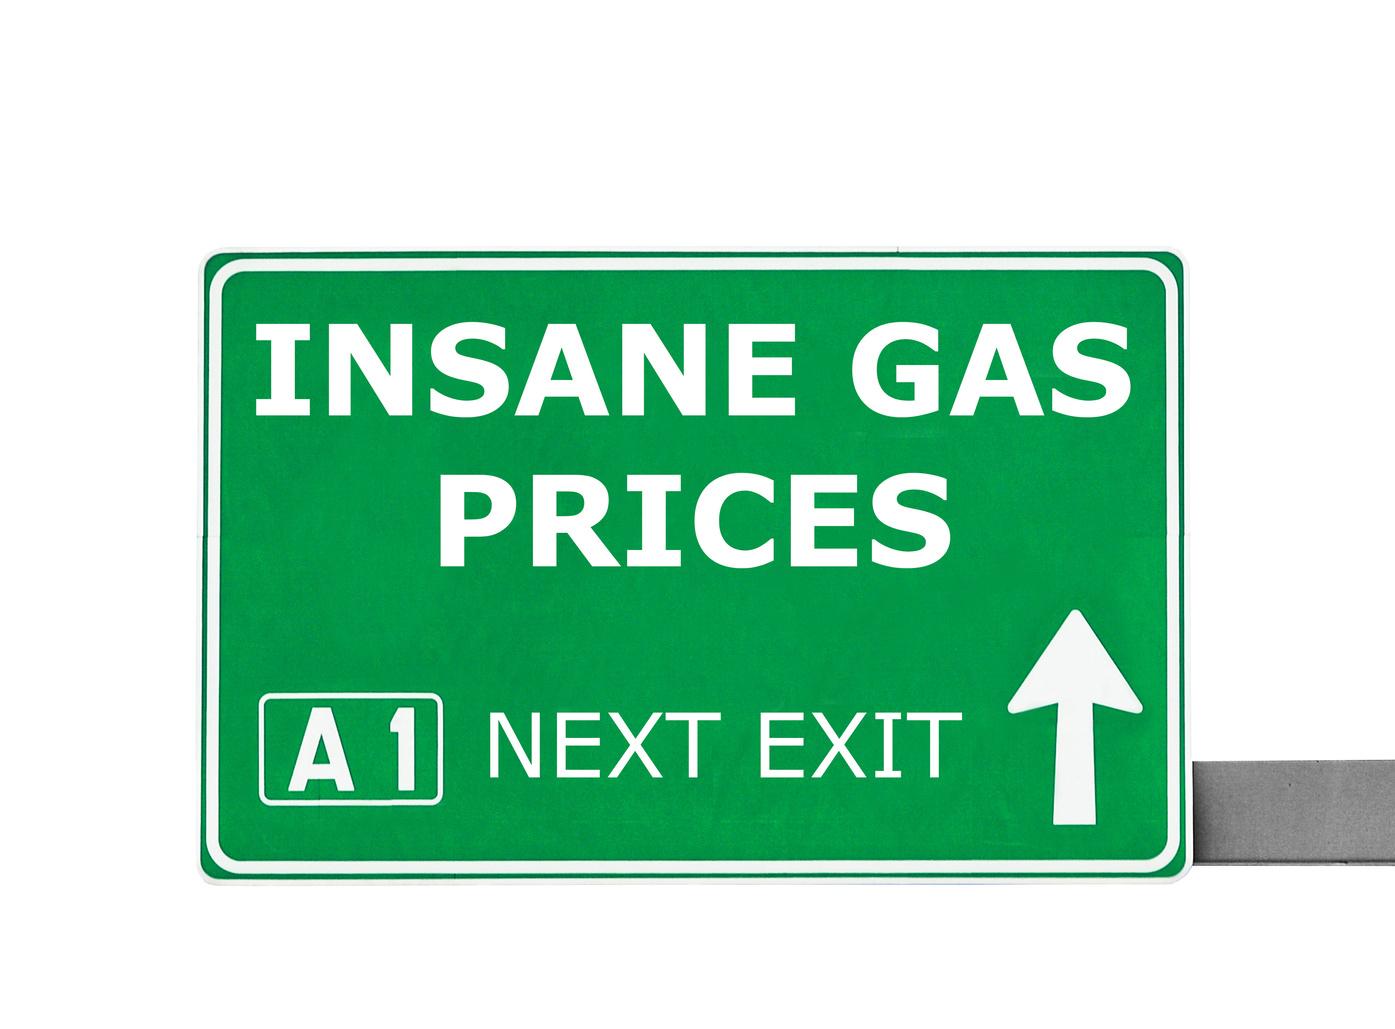 Homeowners Insurance Smyrna Ga Call 770 434 4000 Best